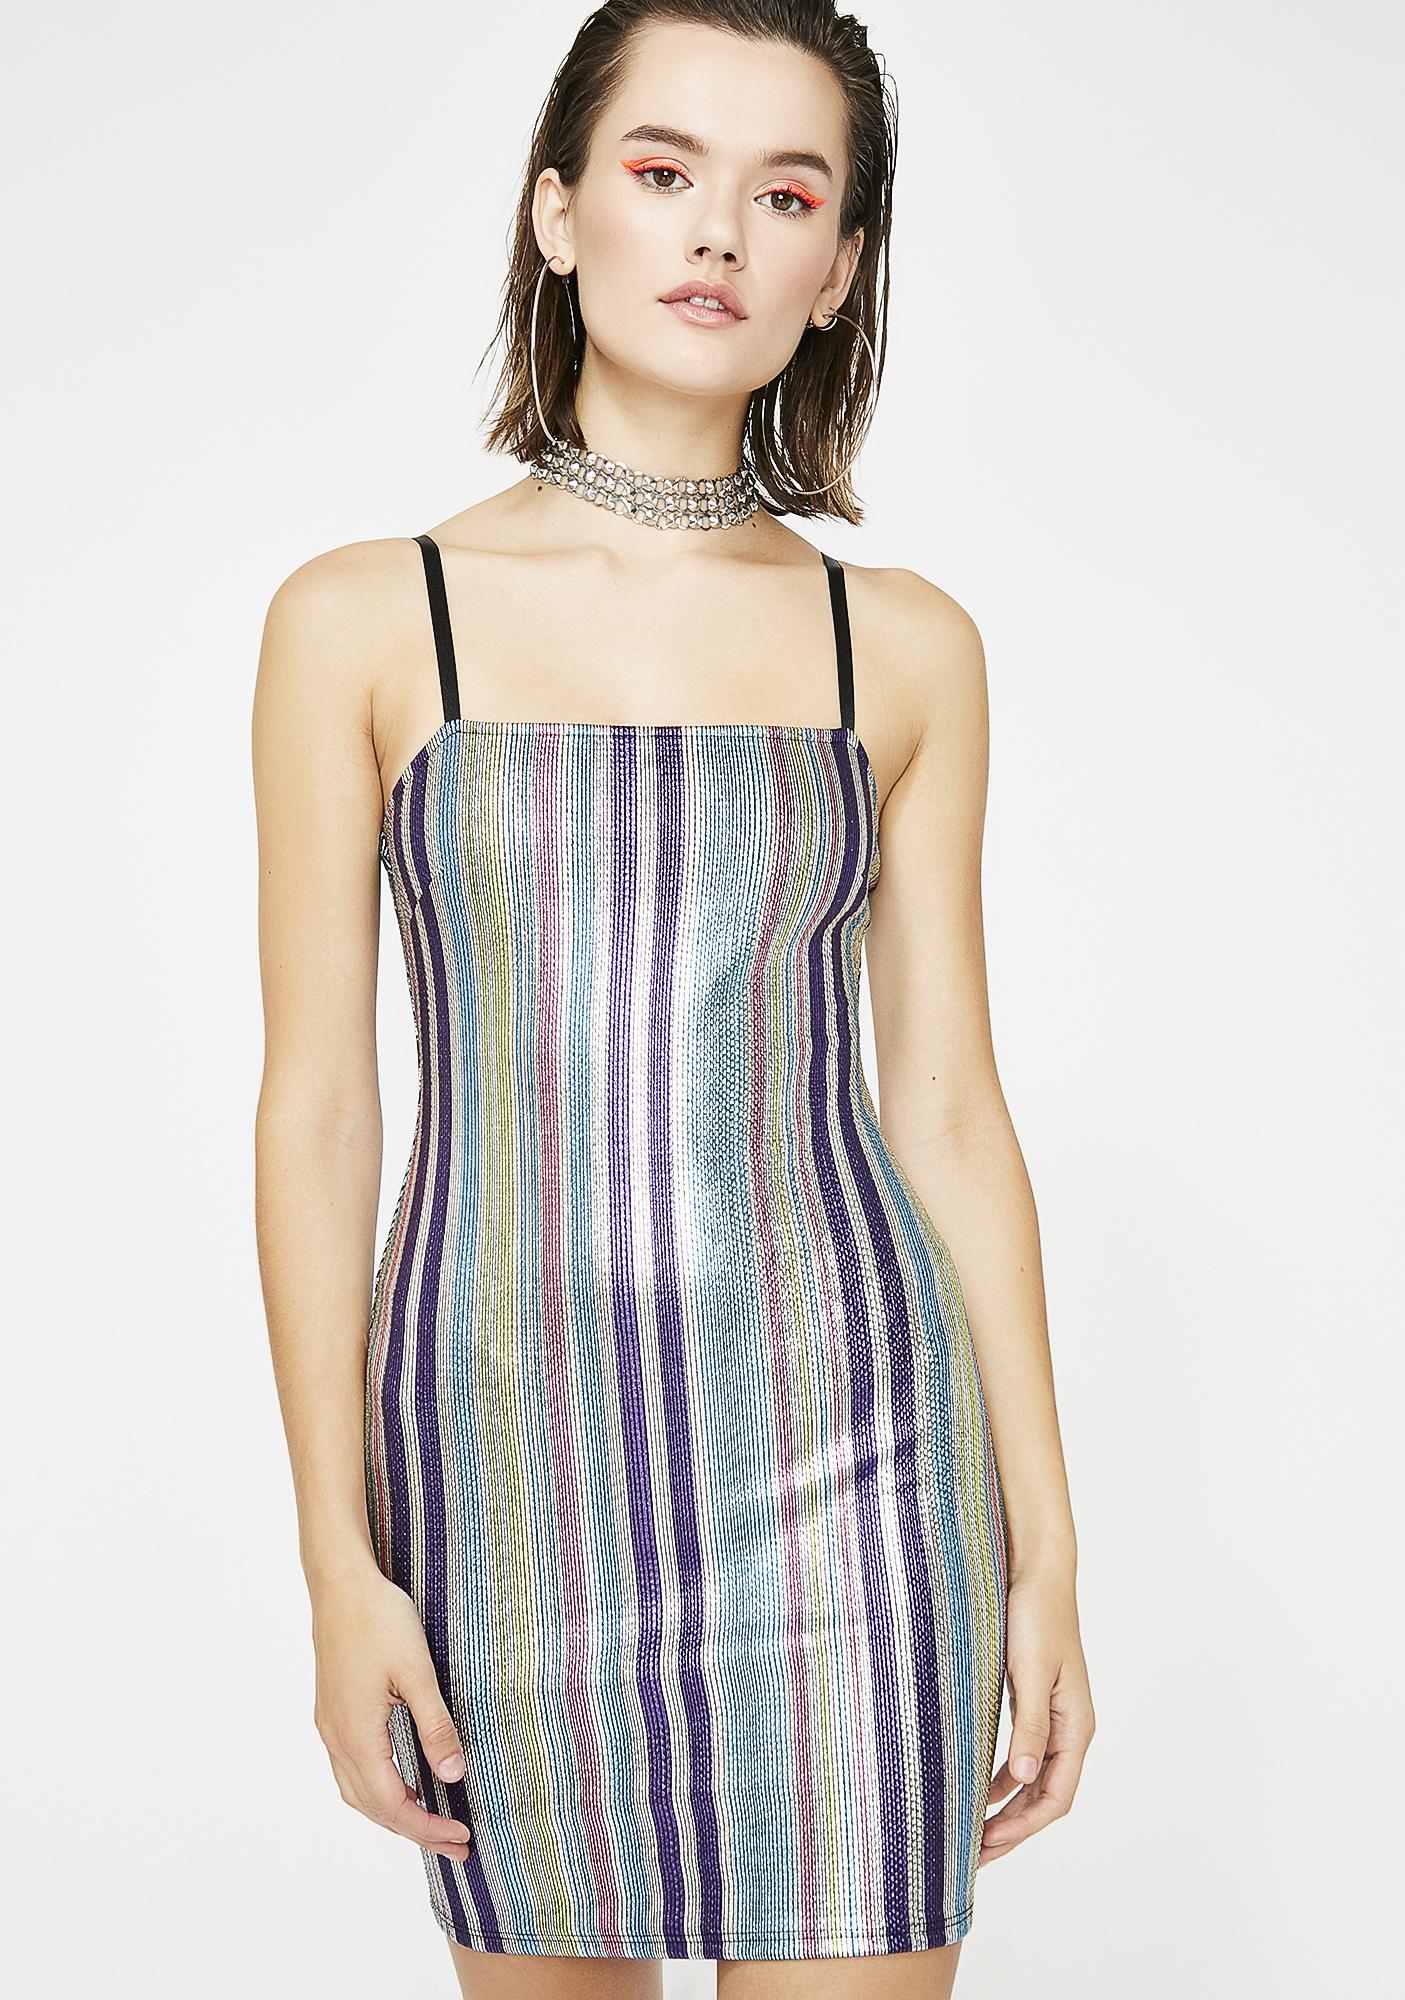 Alwayz Shinin' Metallic Dress